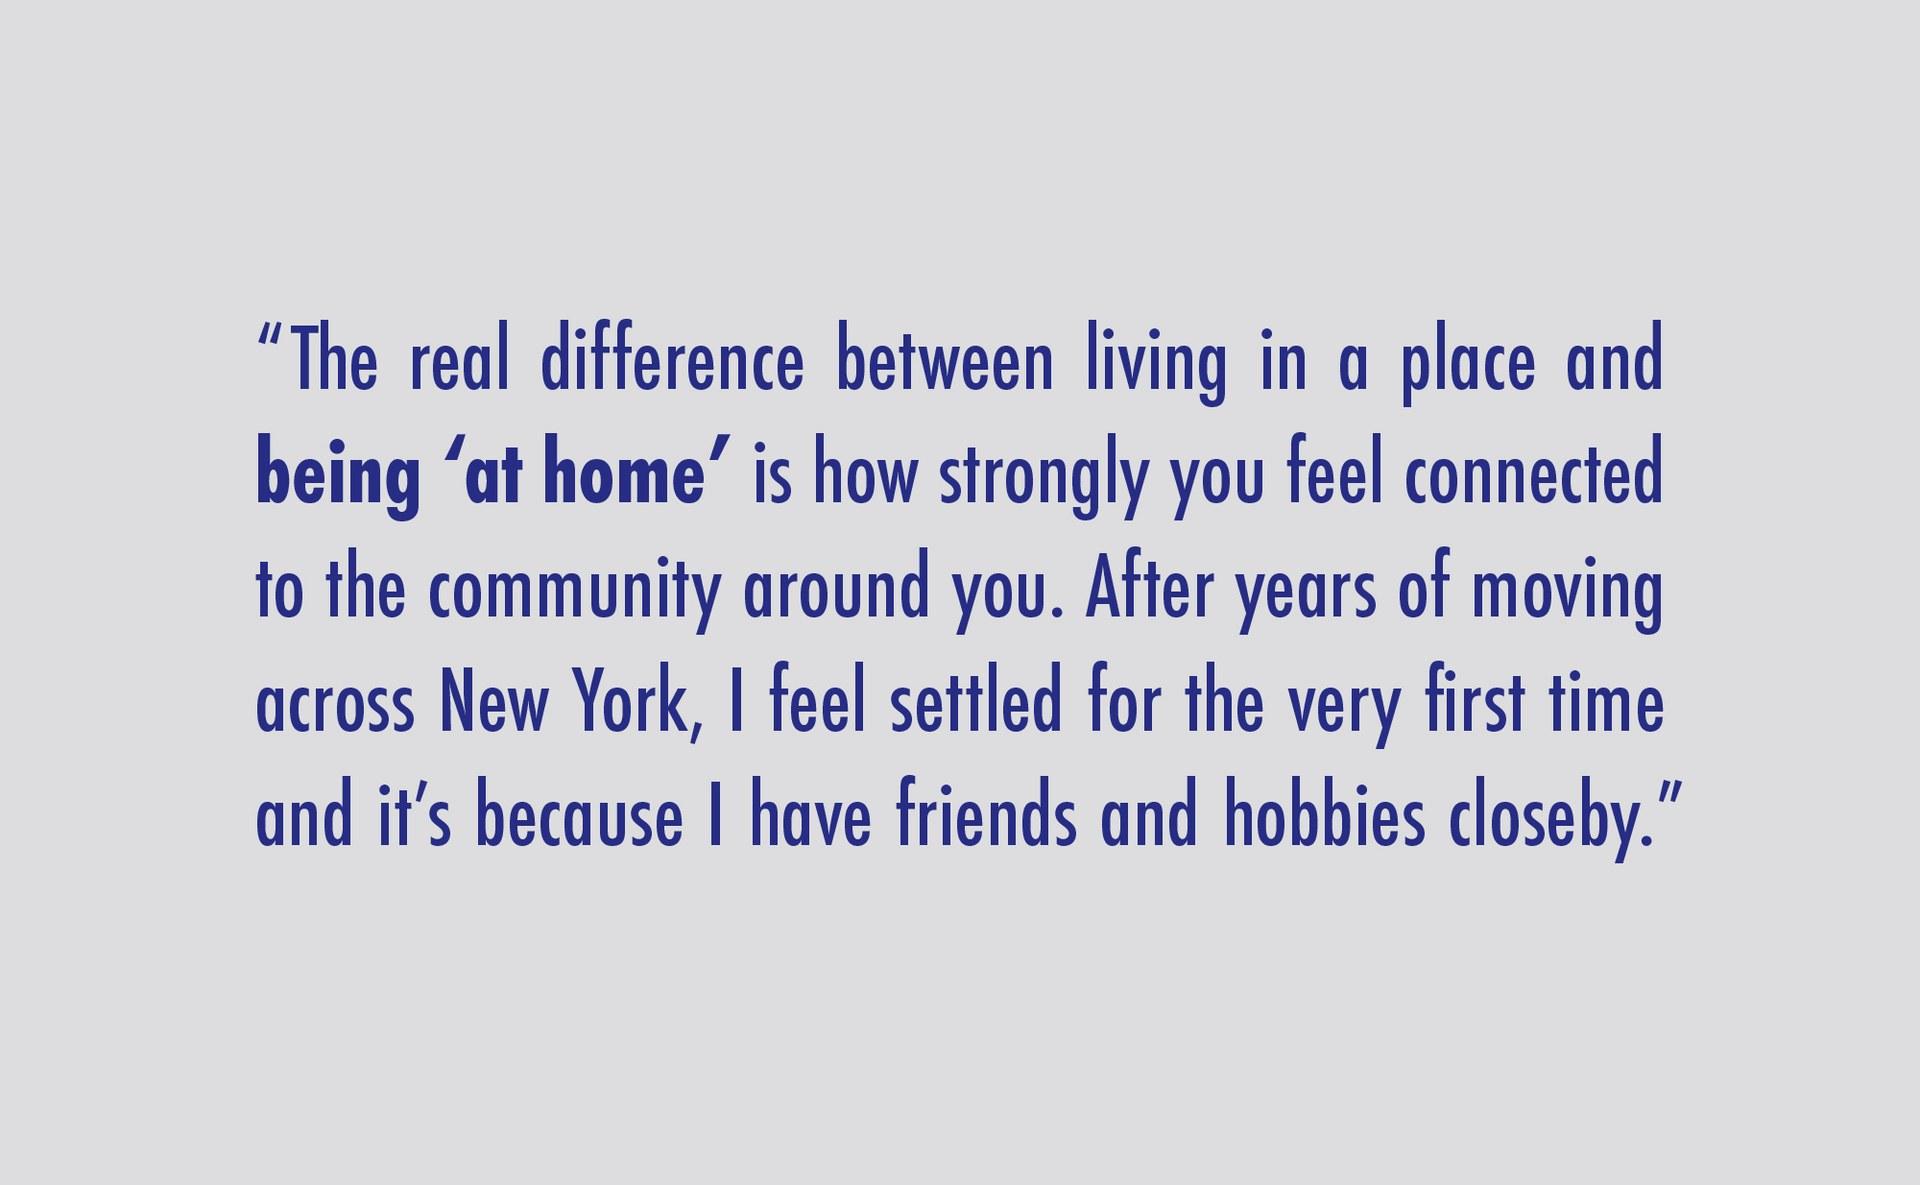 Pal makes communities feel more like home